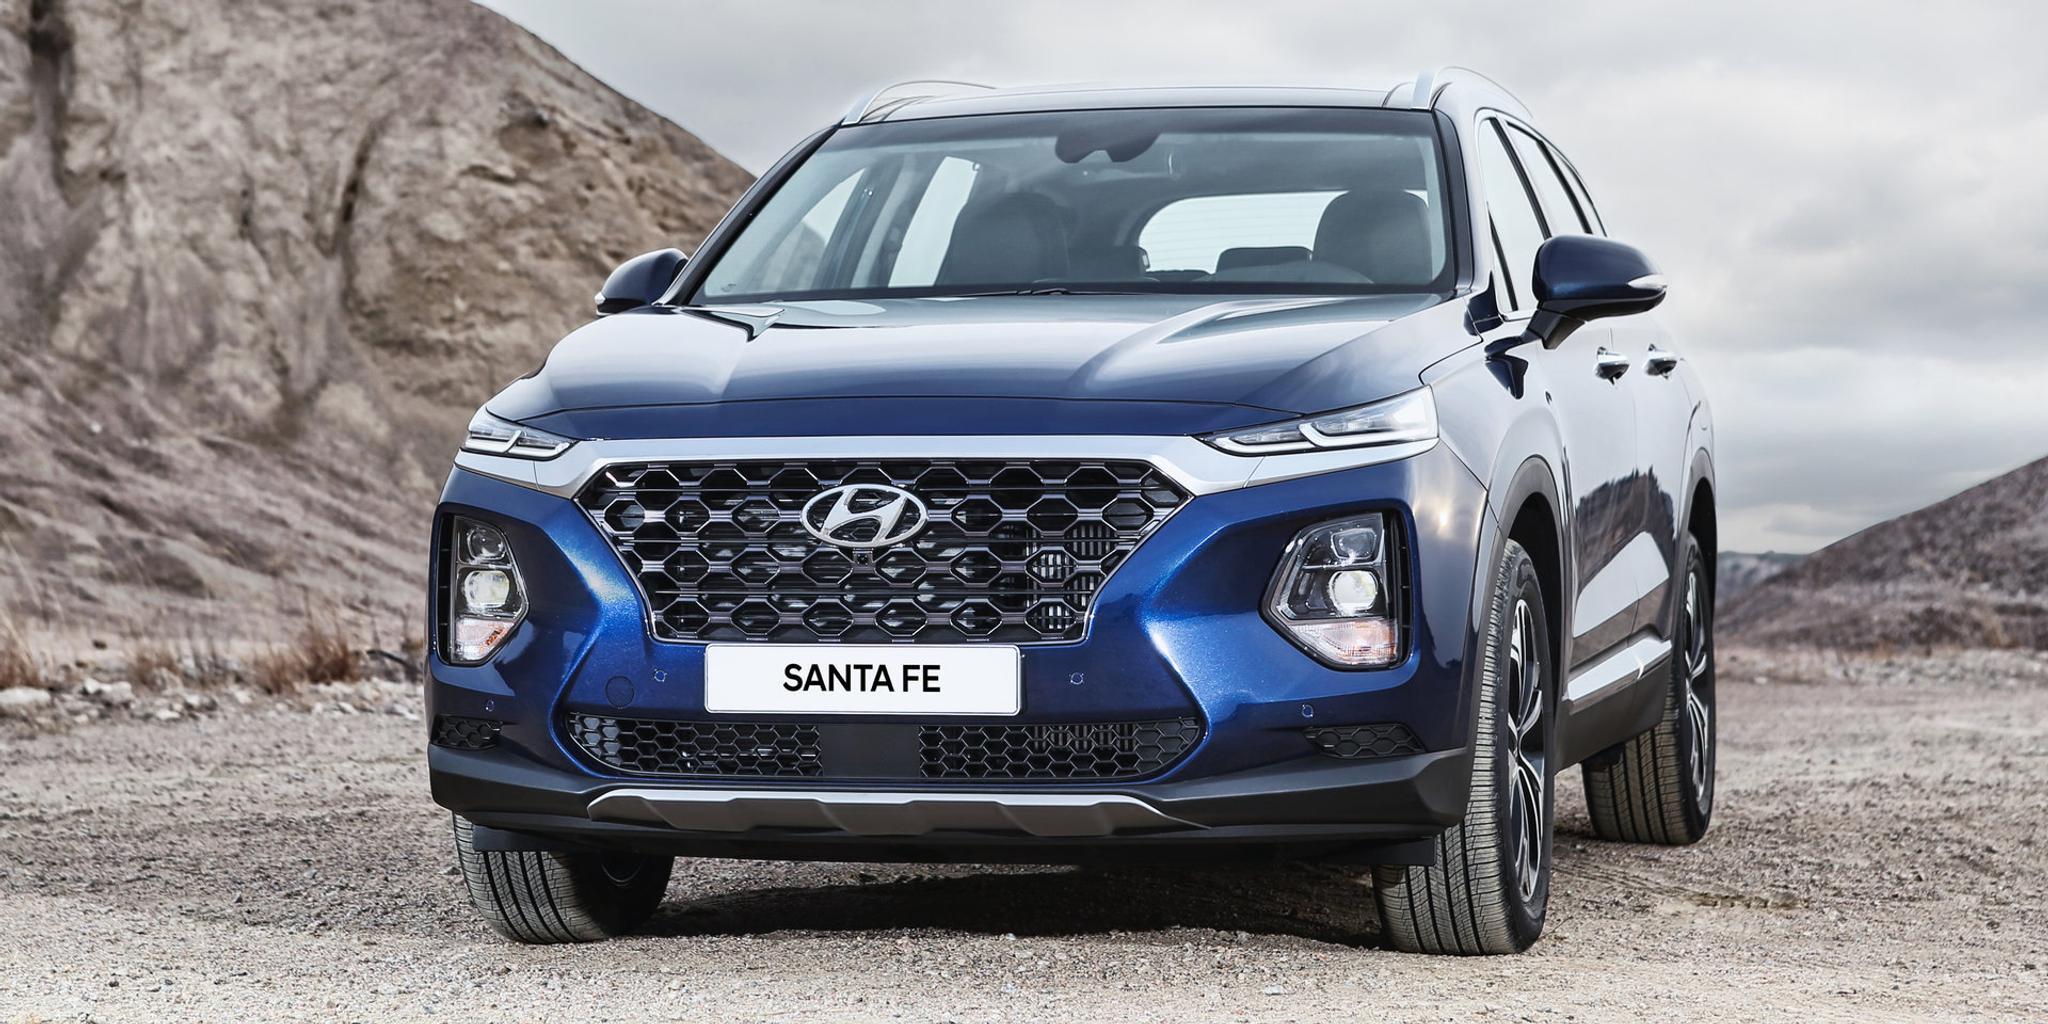 2018 Hyundai Santa Fe >> Tassa On Uusi Hyundai Santa Fe Tuulilasi Tuulilasi